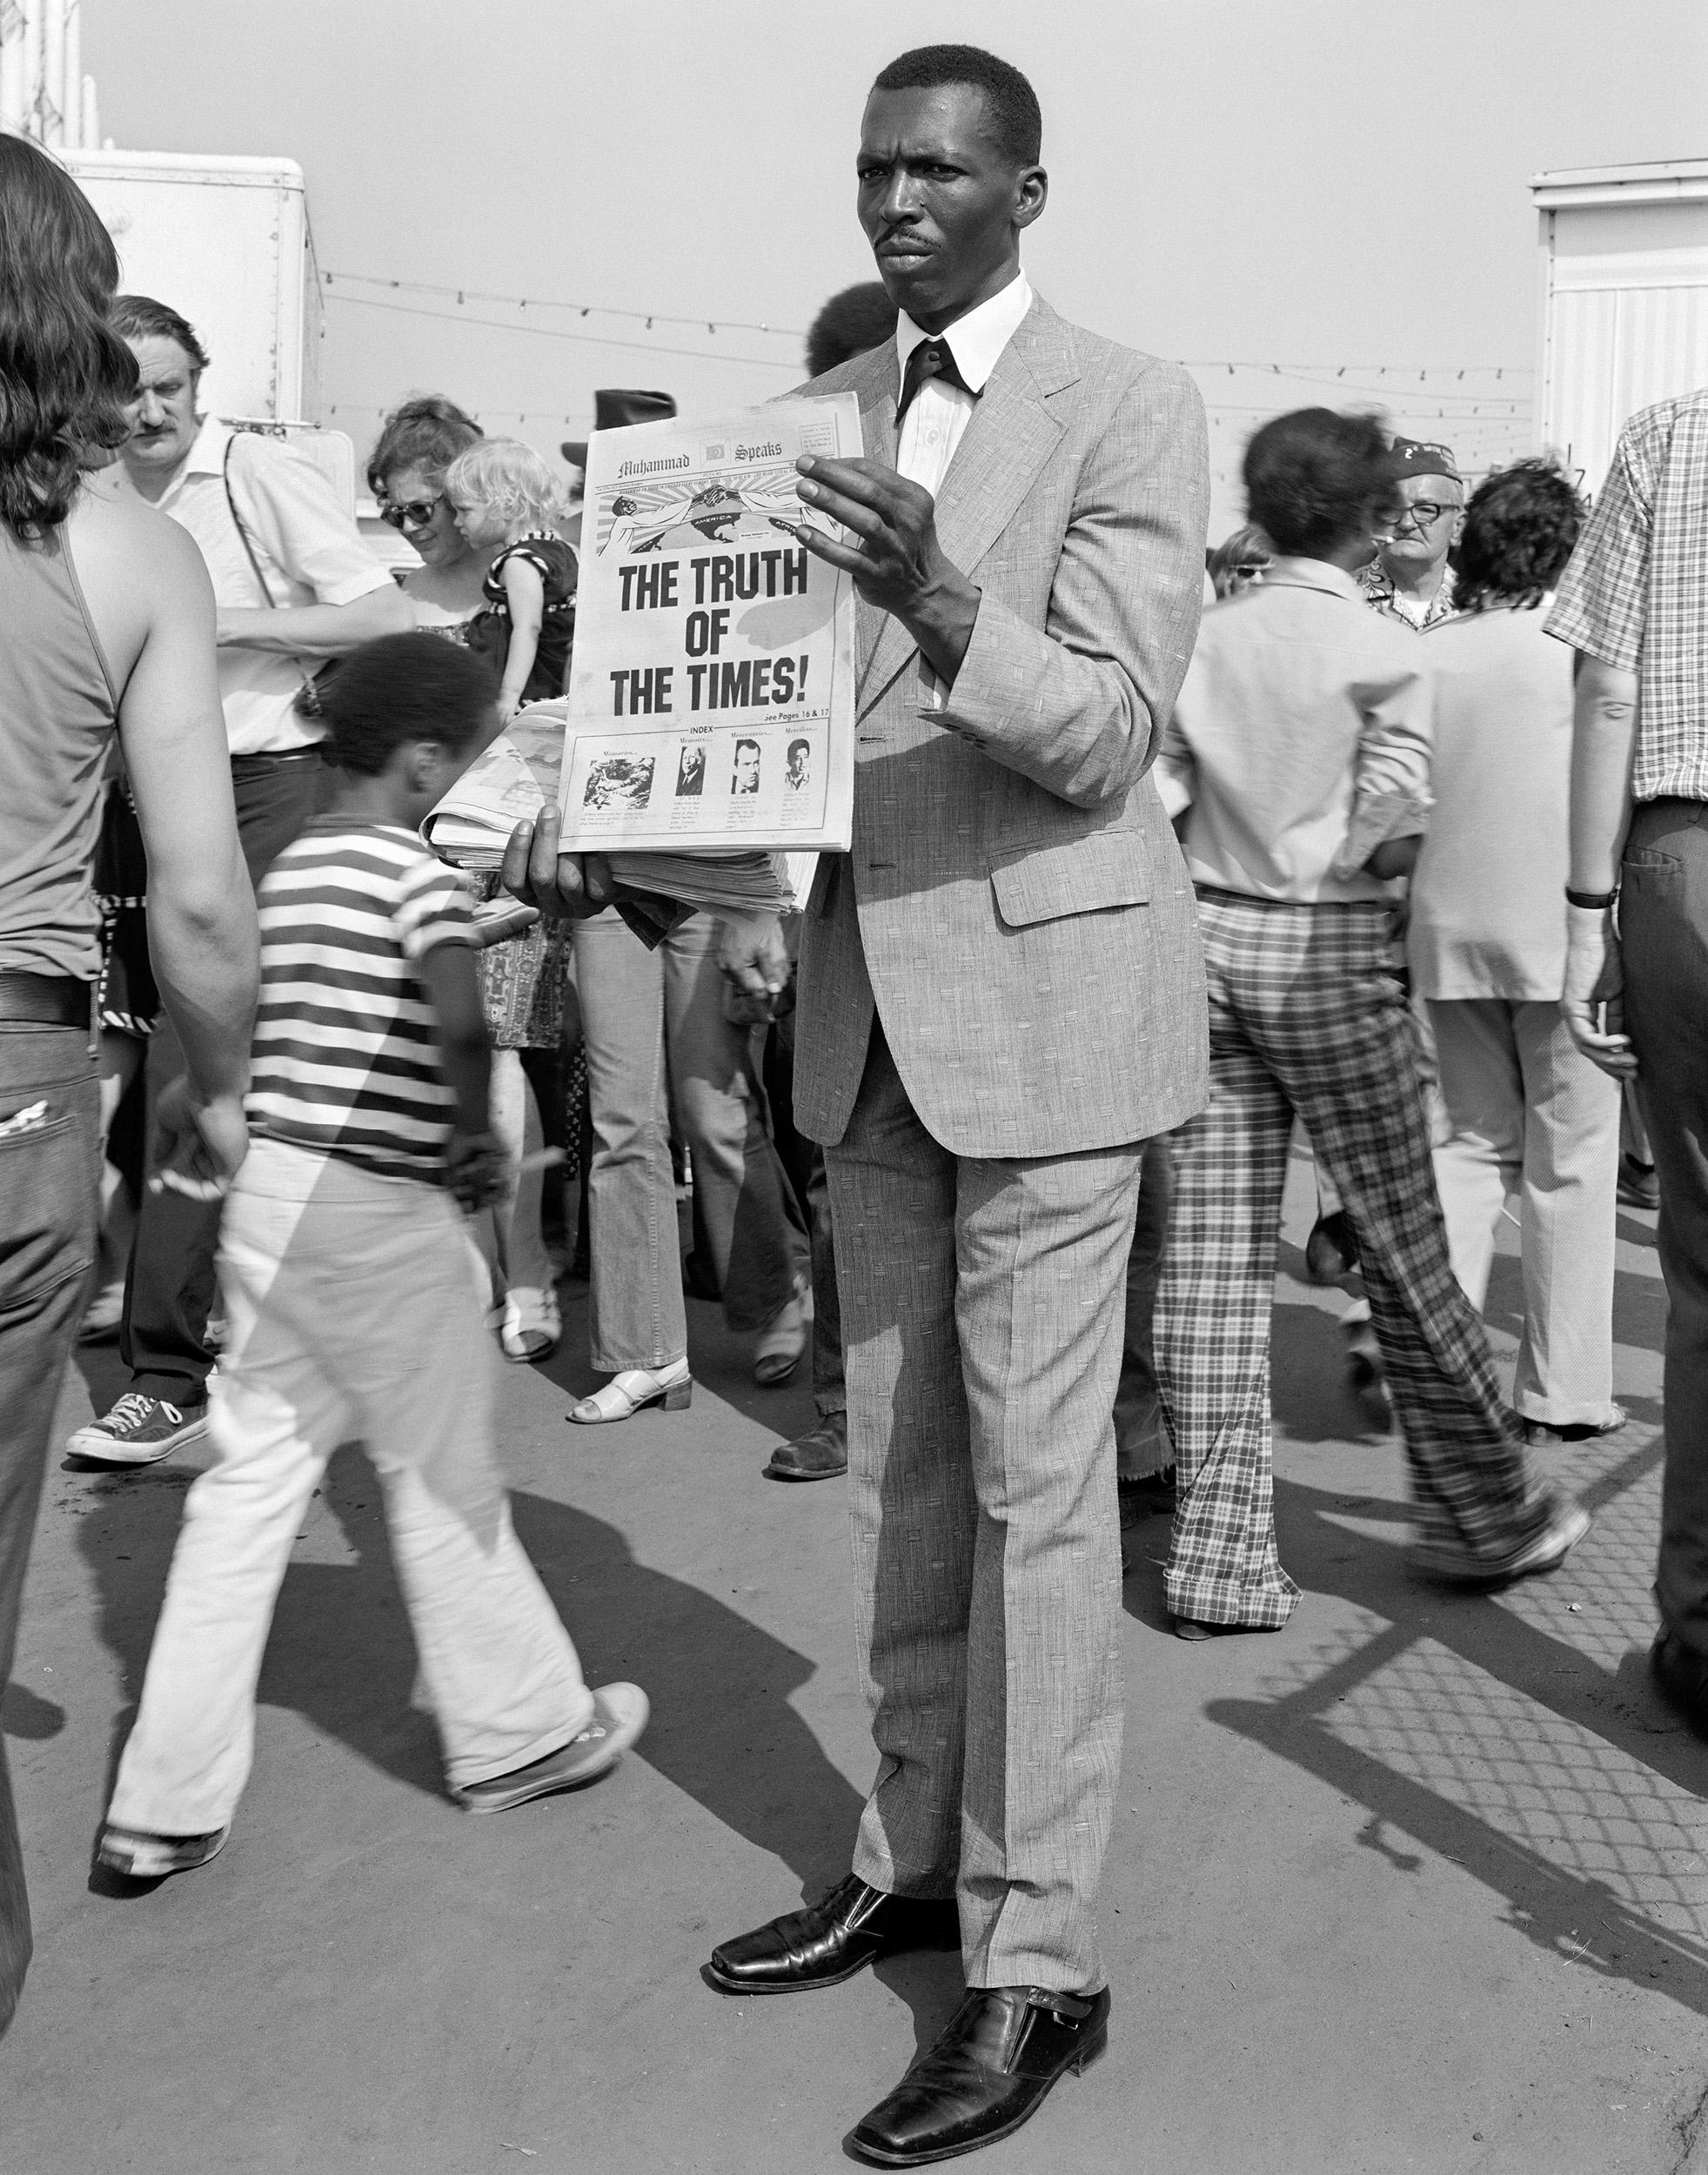 Man Handing Out Muslim Newspaper, Detroit, Michigan, 1973